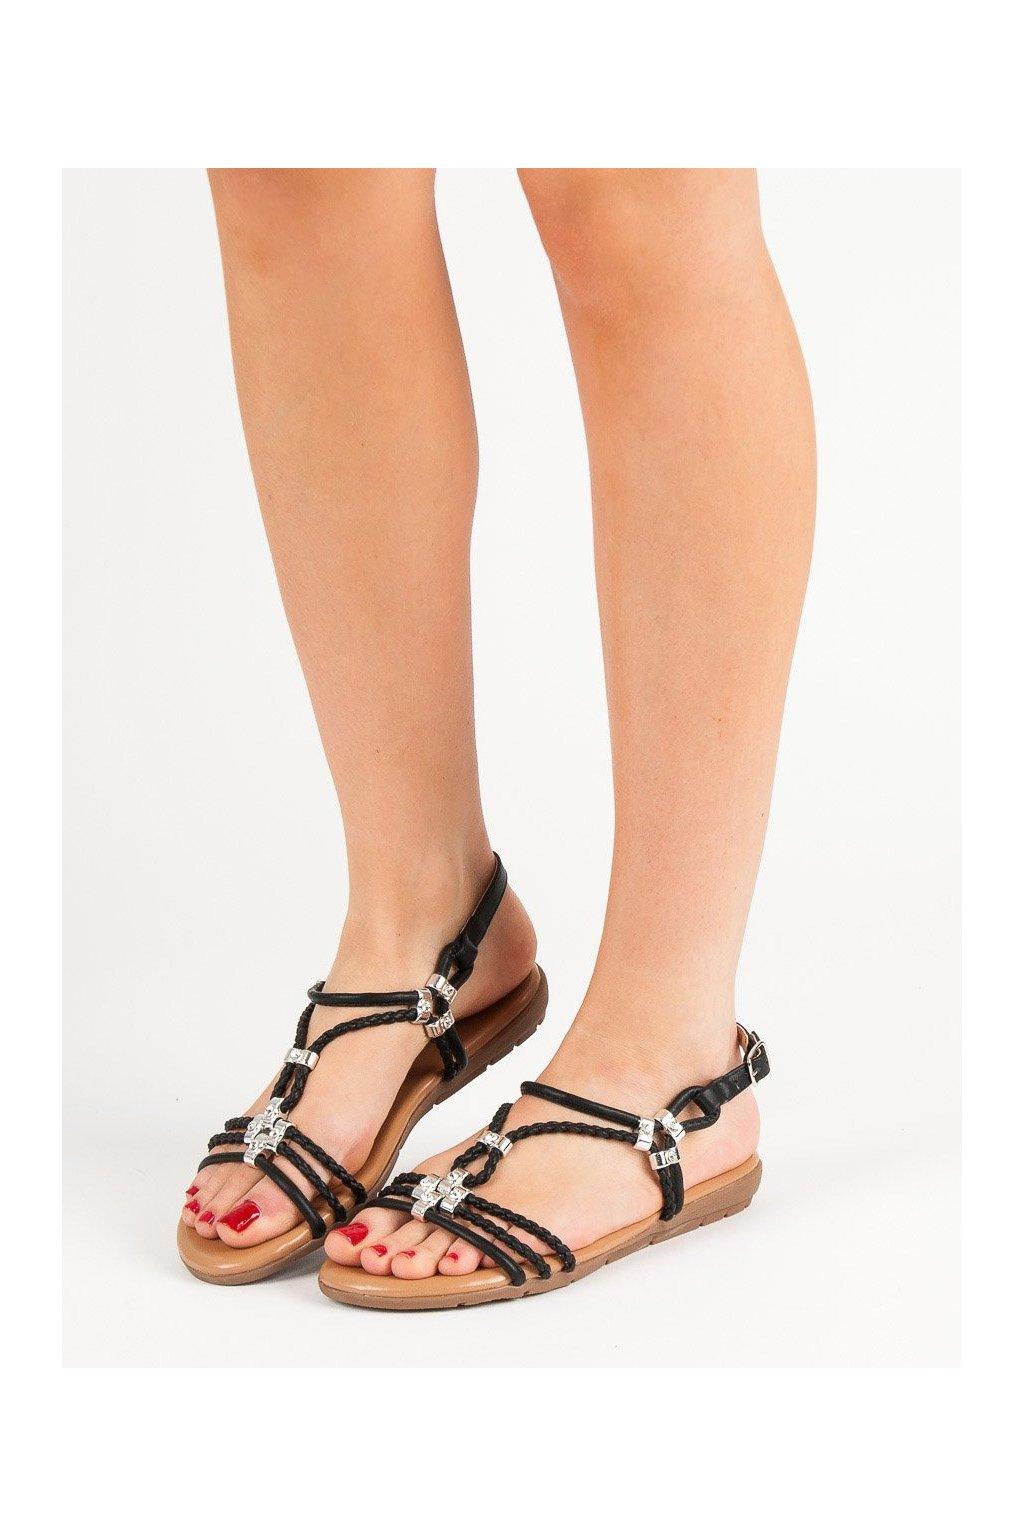 Čierne sandále Cm paris kod 839-739B